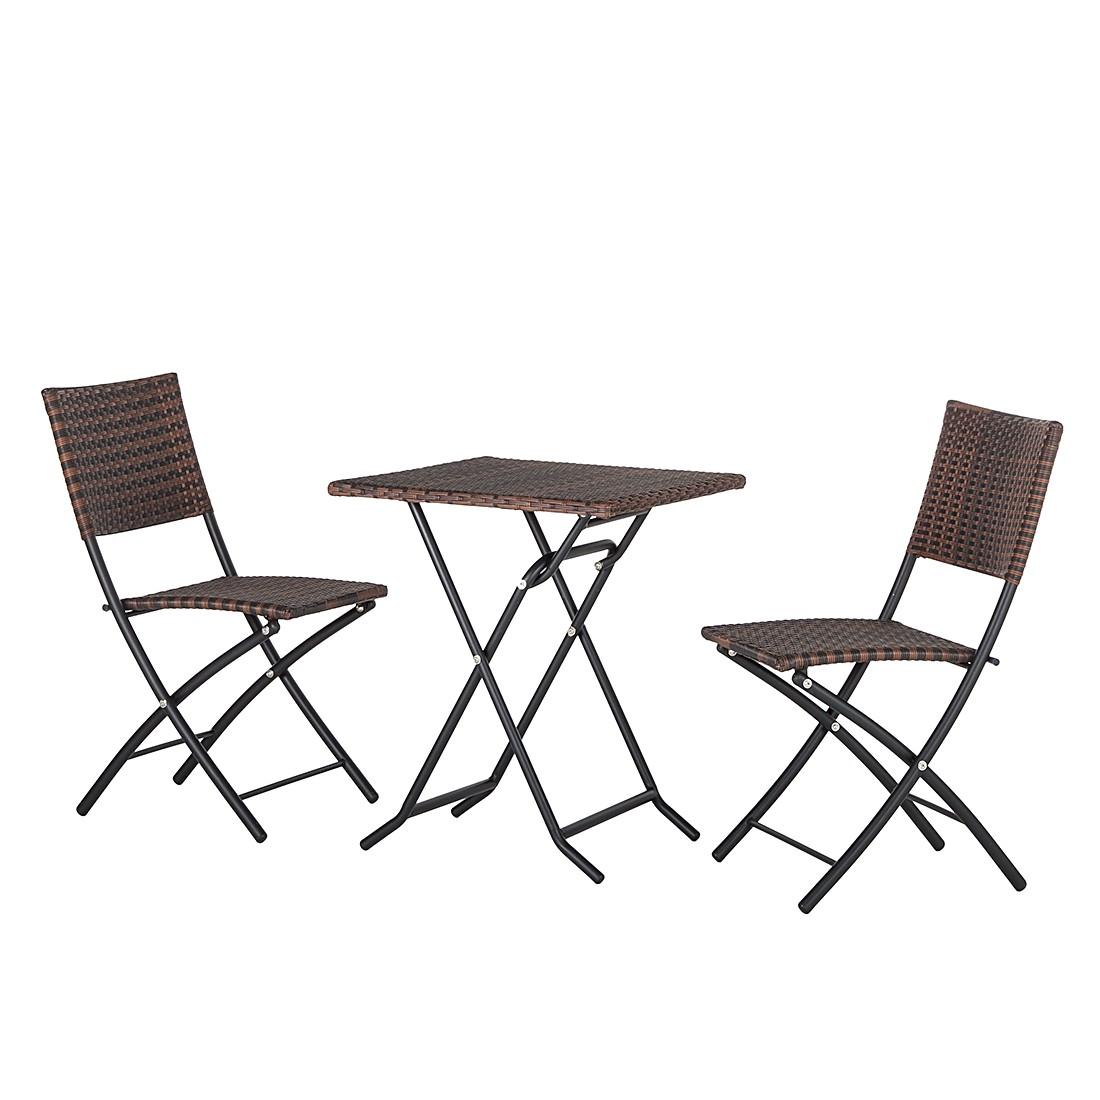 Balkon-/tuinset Paradise Lounge (3-delig) - polyrotan - bruin, Fredriks